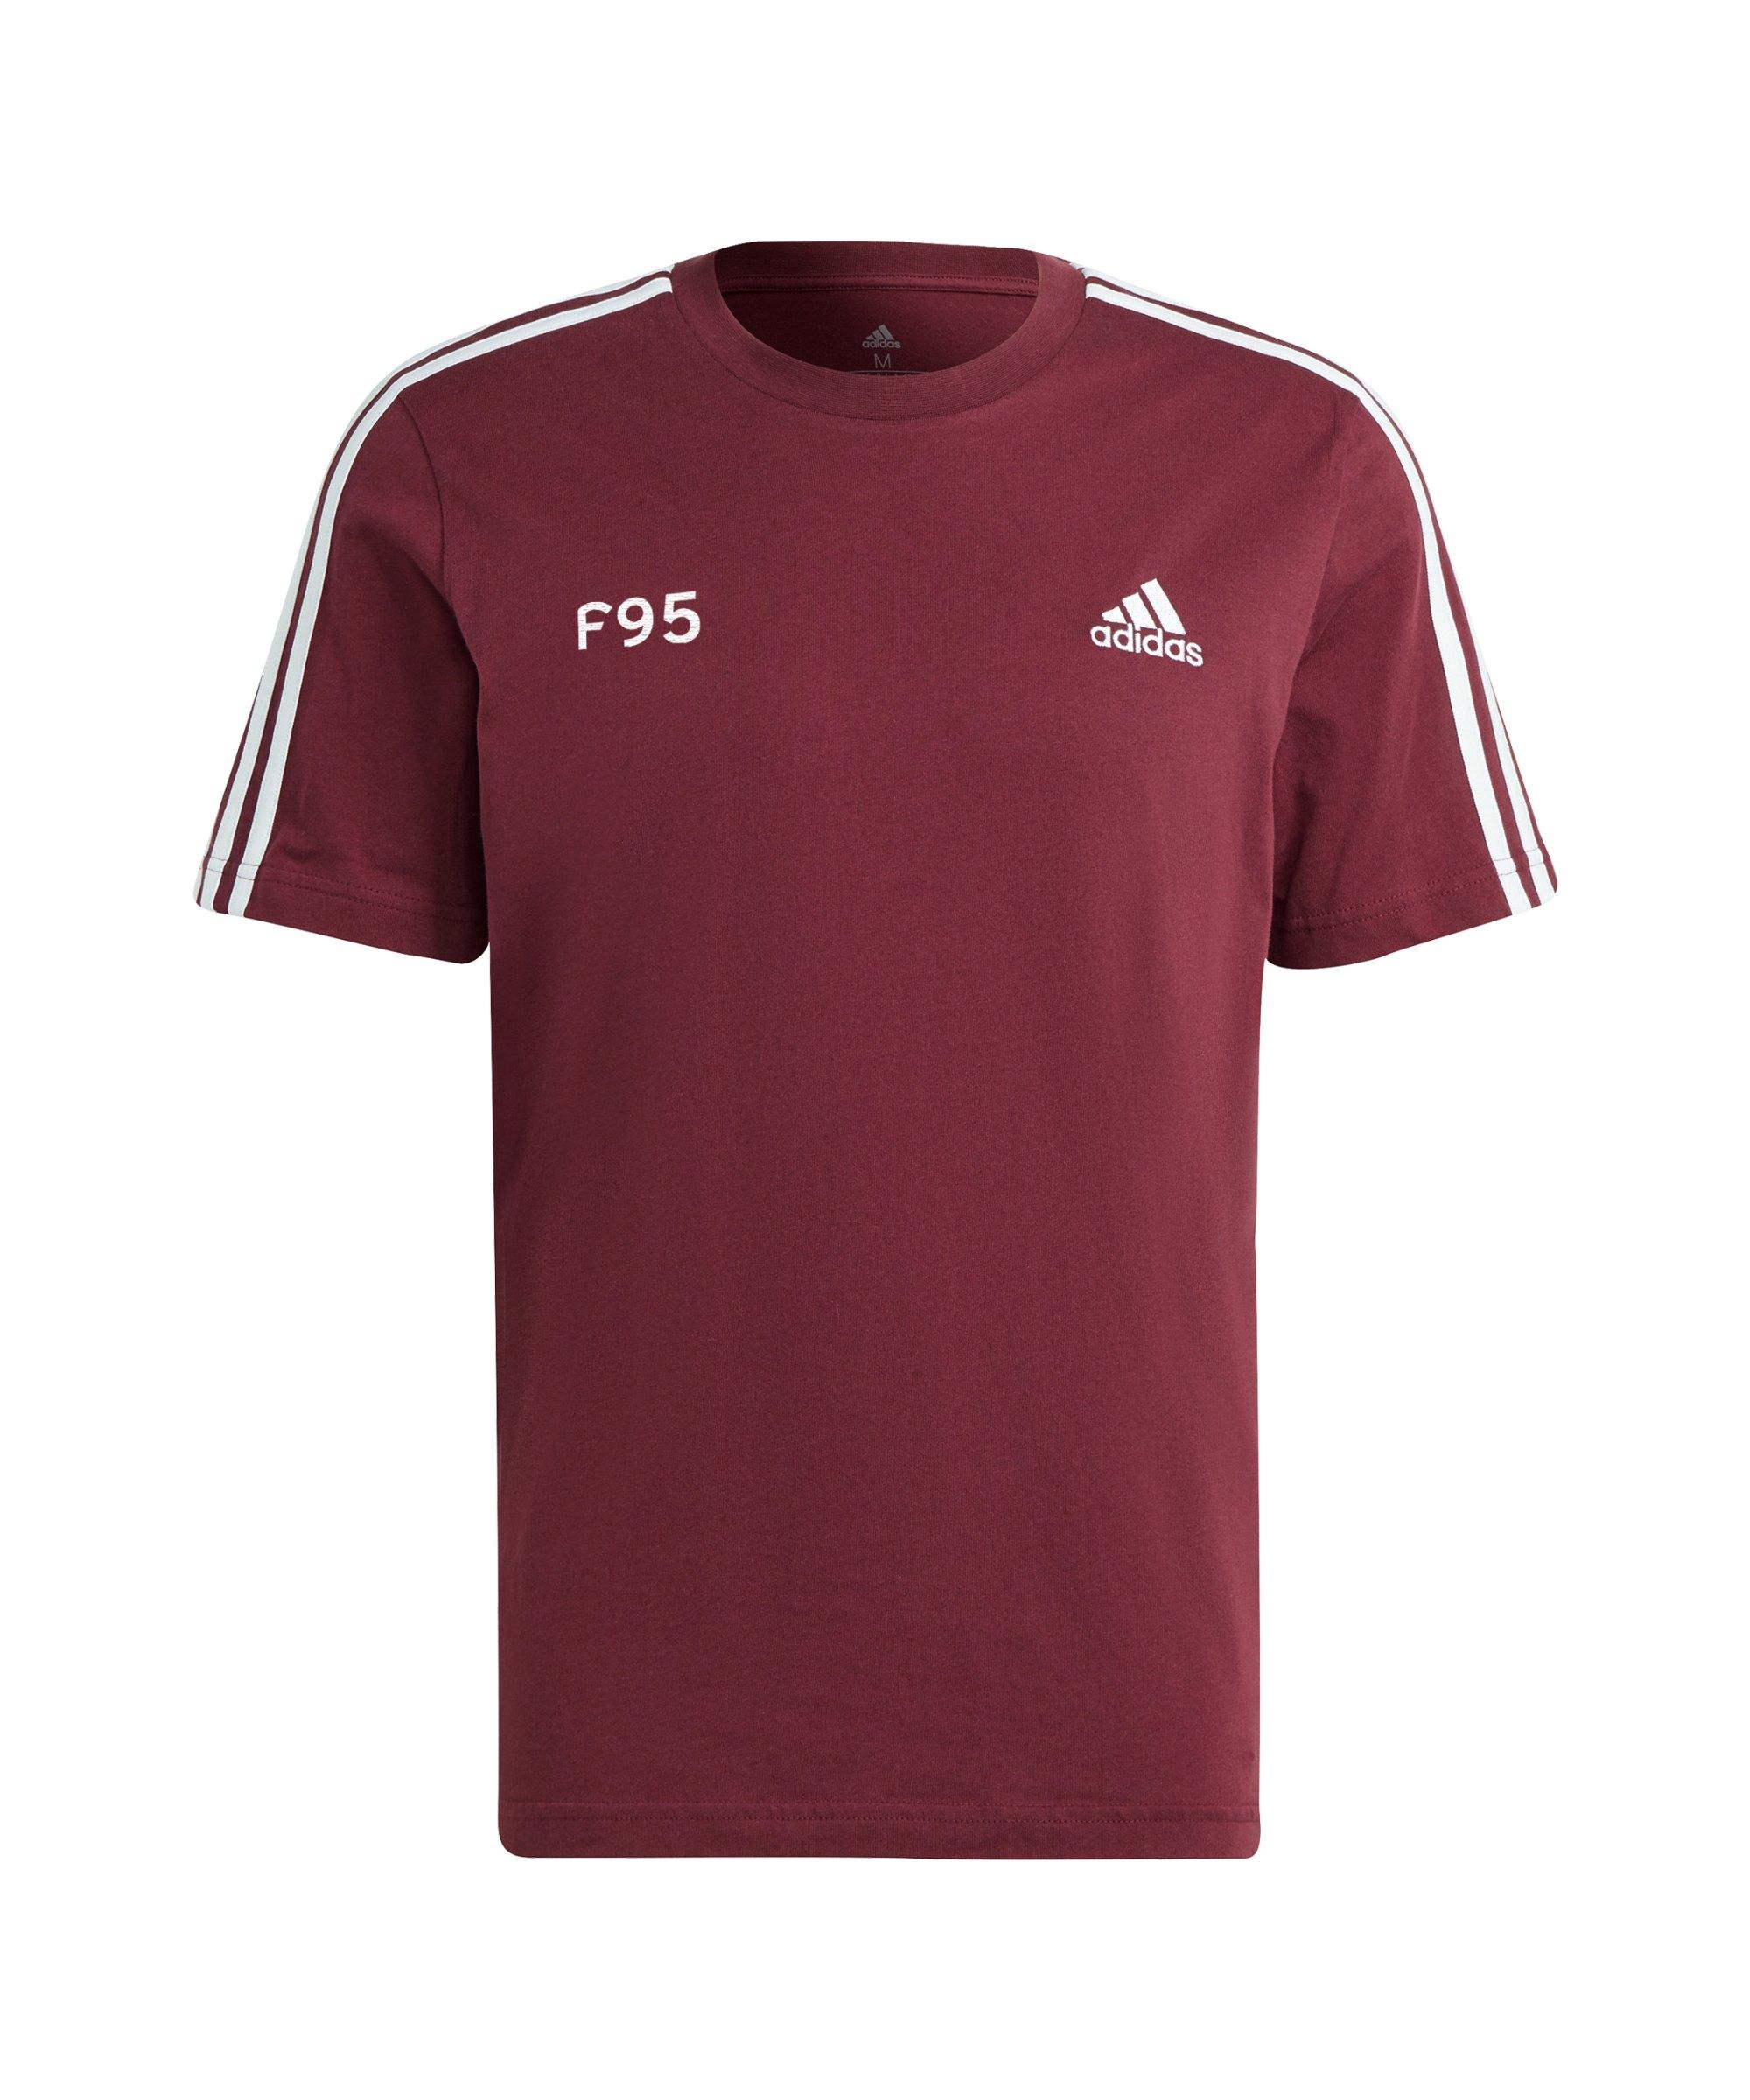 adidas Fortuna Düsseldorf Freizeit T-Shirt Rot - rot